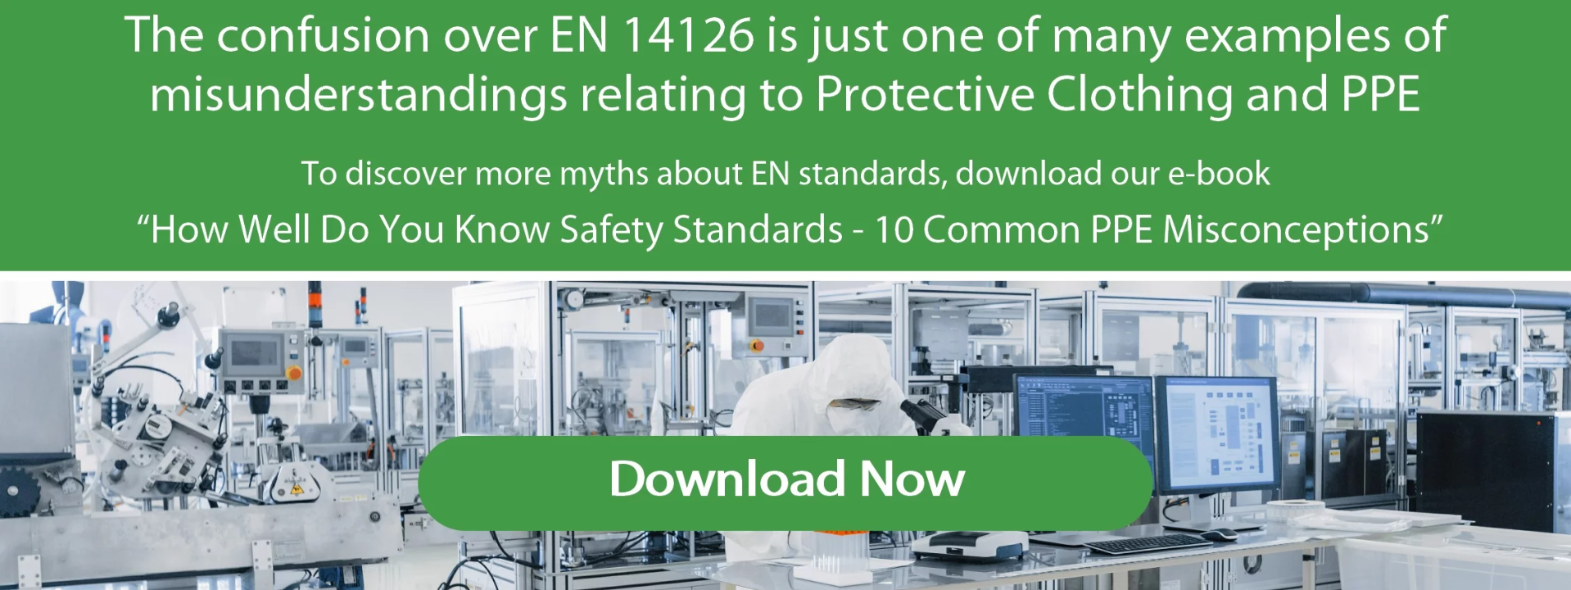 Ten Common PPE Misconceptions